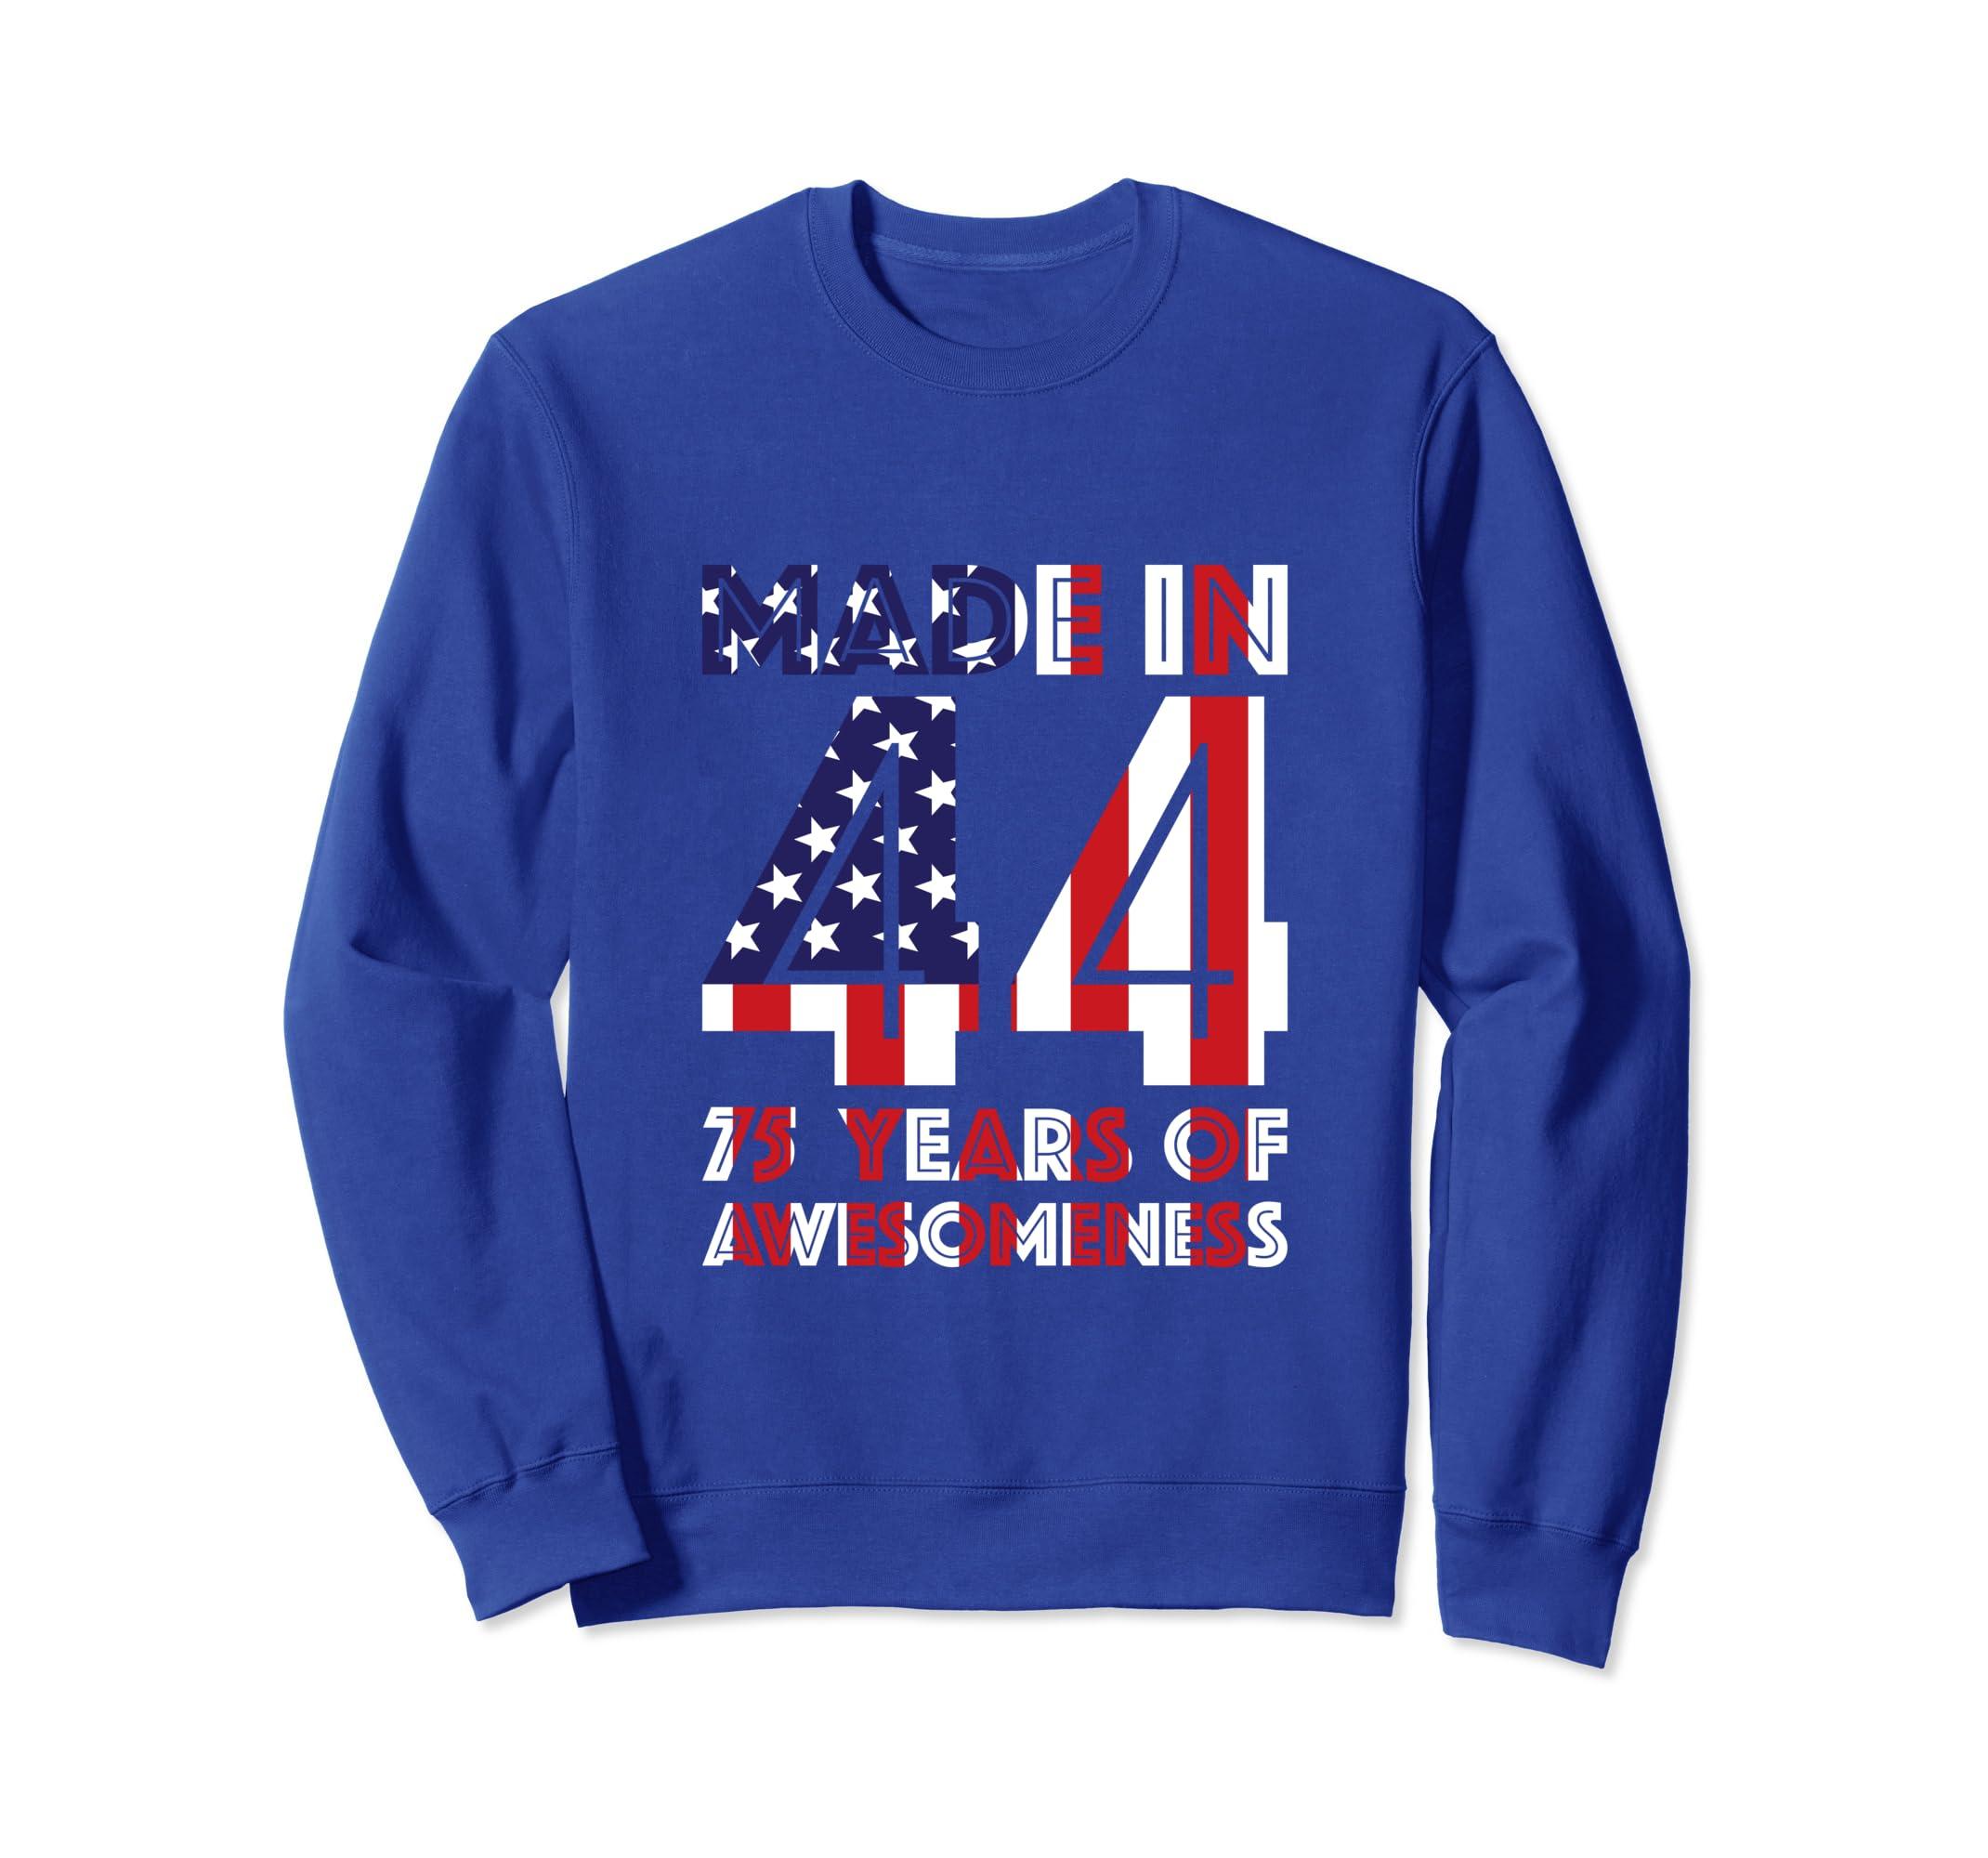 Amazon 75th Birthday Sweatshirt Gifts Men Age 75 Year Old Grandpa Clothing